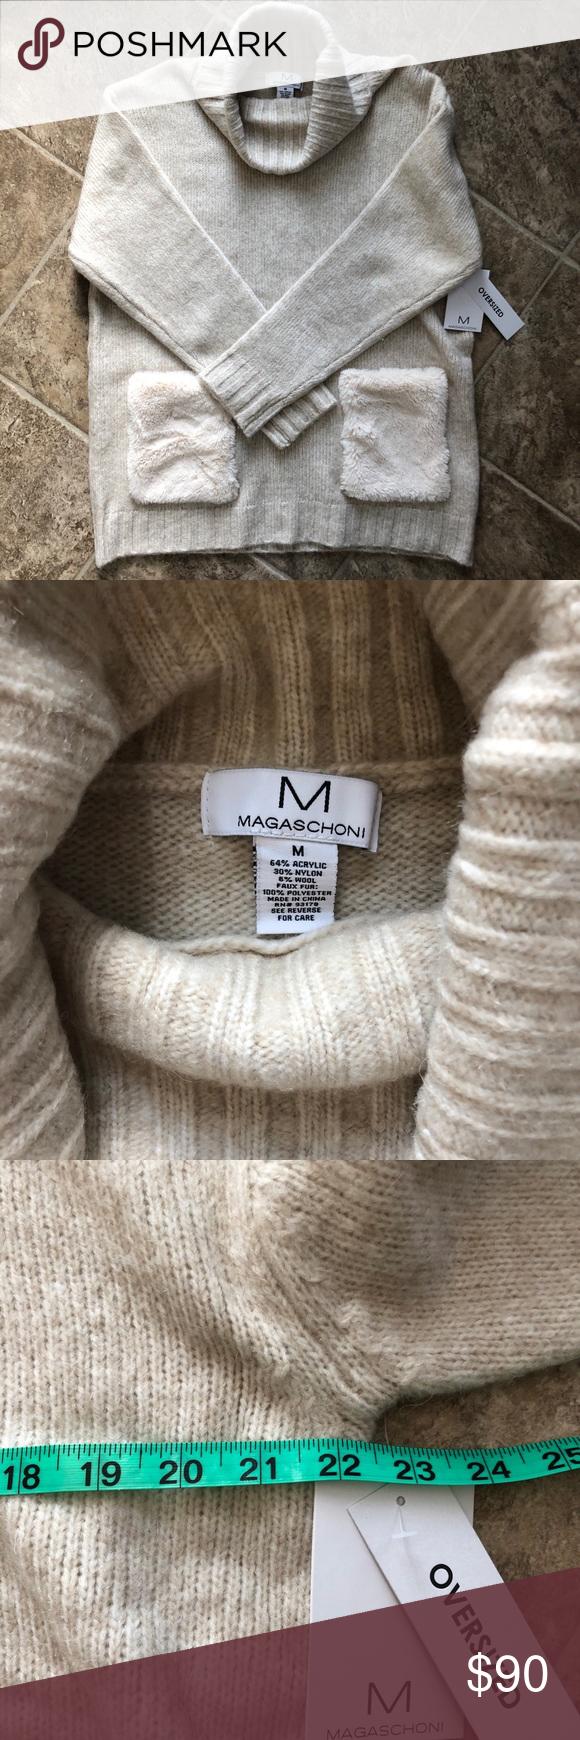 2770b318ec9 NWT Magaschoni Cream Oversized Turtleneck Sweater New with tags! Oversized.  Magaschoni Sweaters